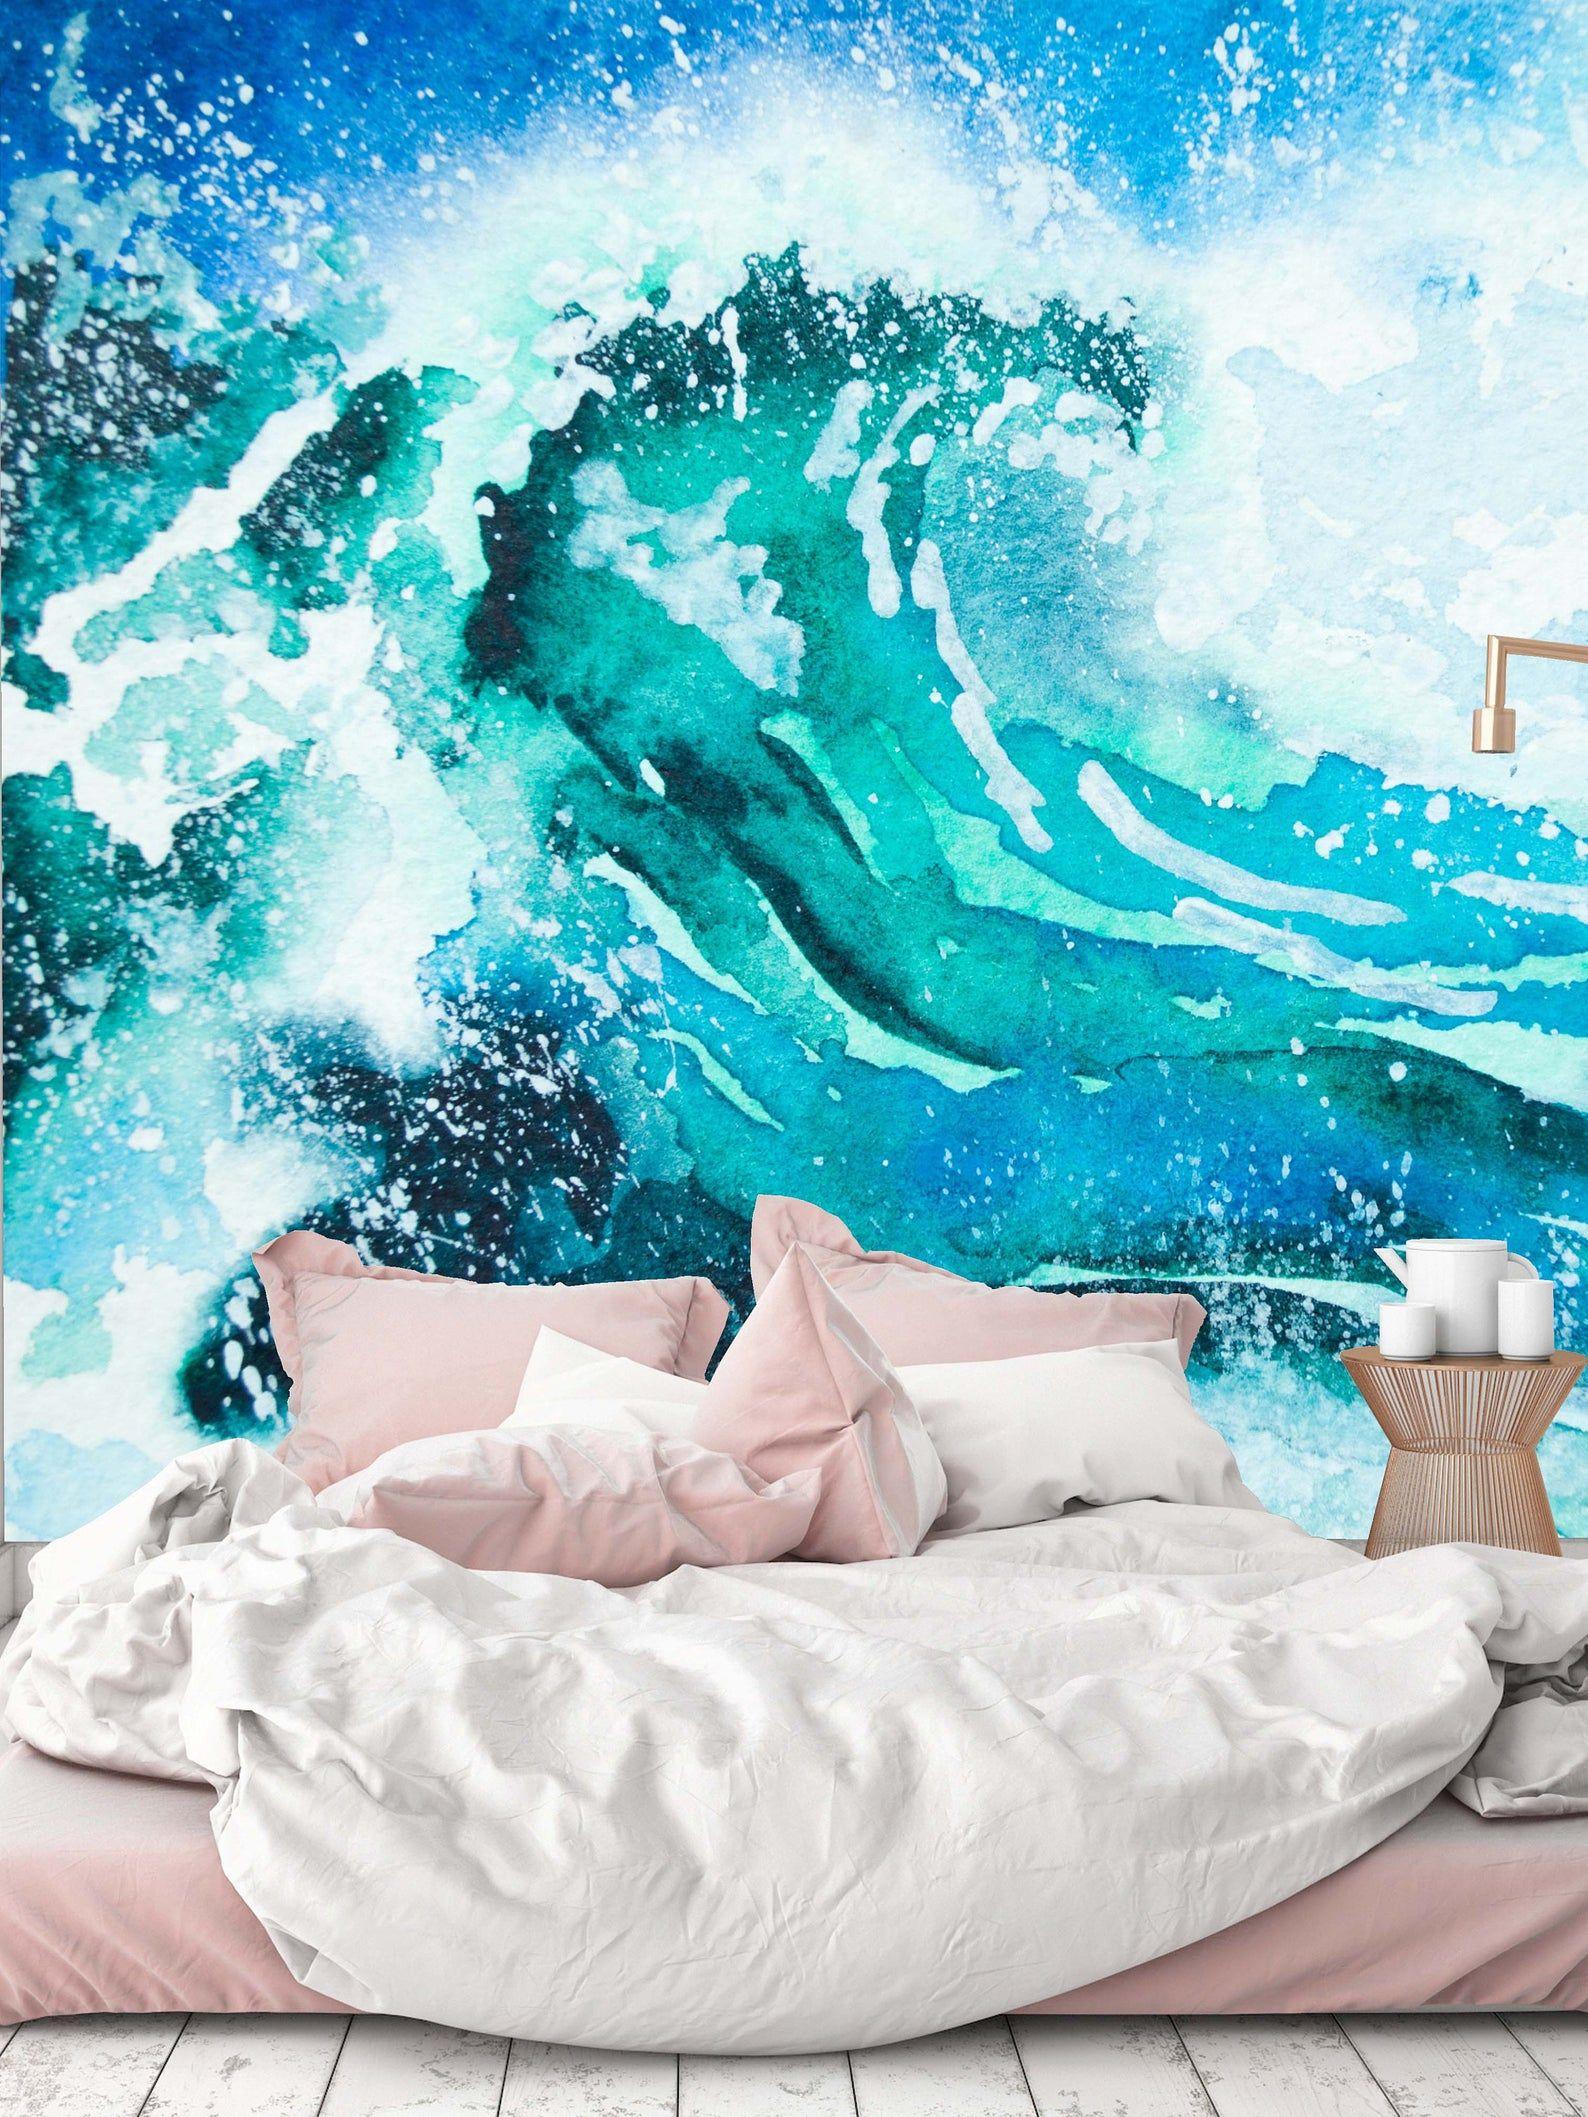 Removable Wallpaper Mural Peel & Stick Watercolor Painting